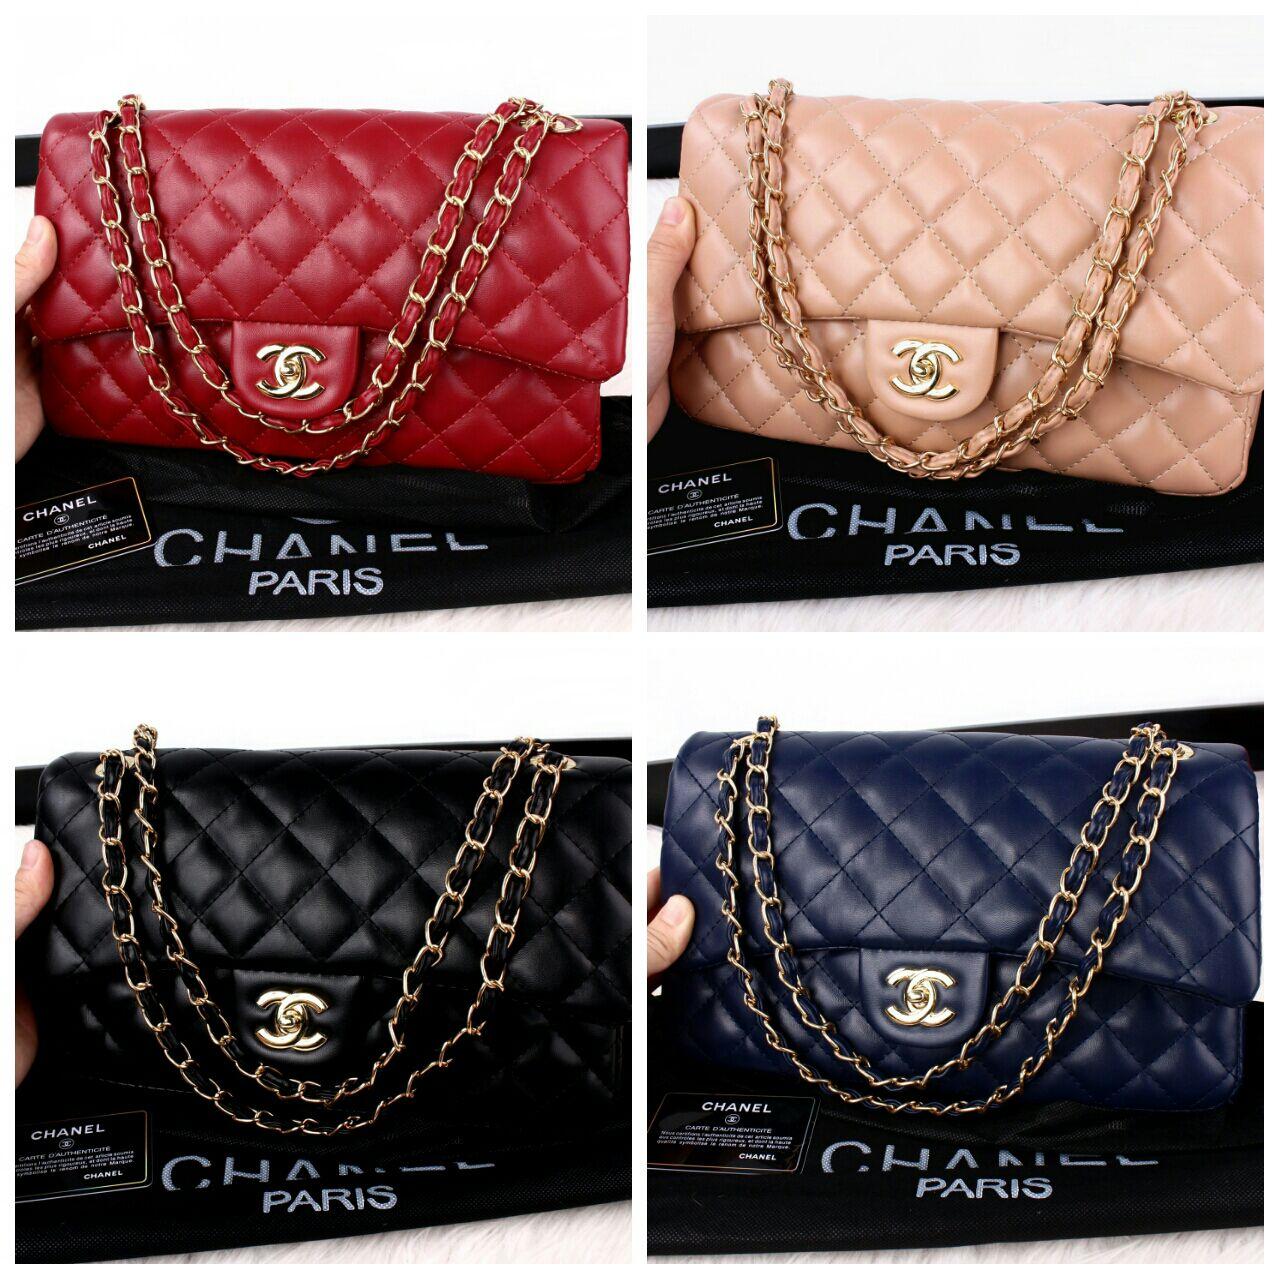 Jual Tas Chanel Maxi Yuni Sara Flap Bag (Goldhware) 5011 - DMD ... 0fce3b2737